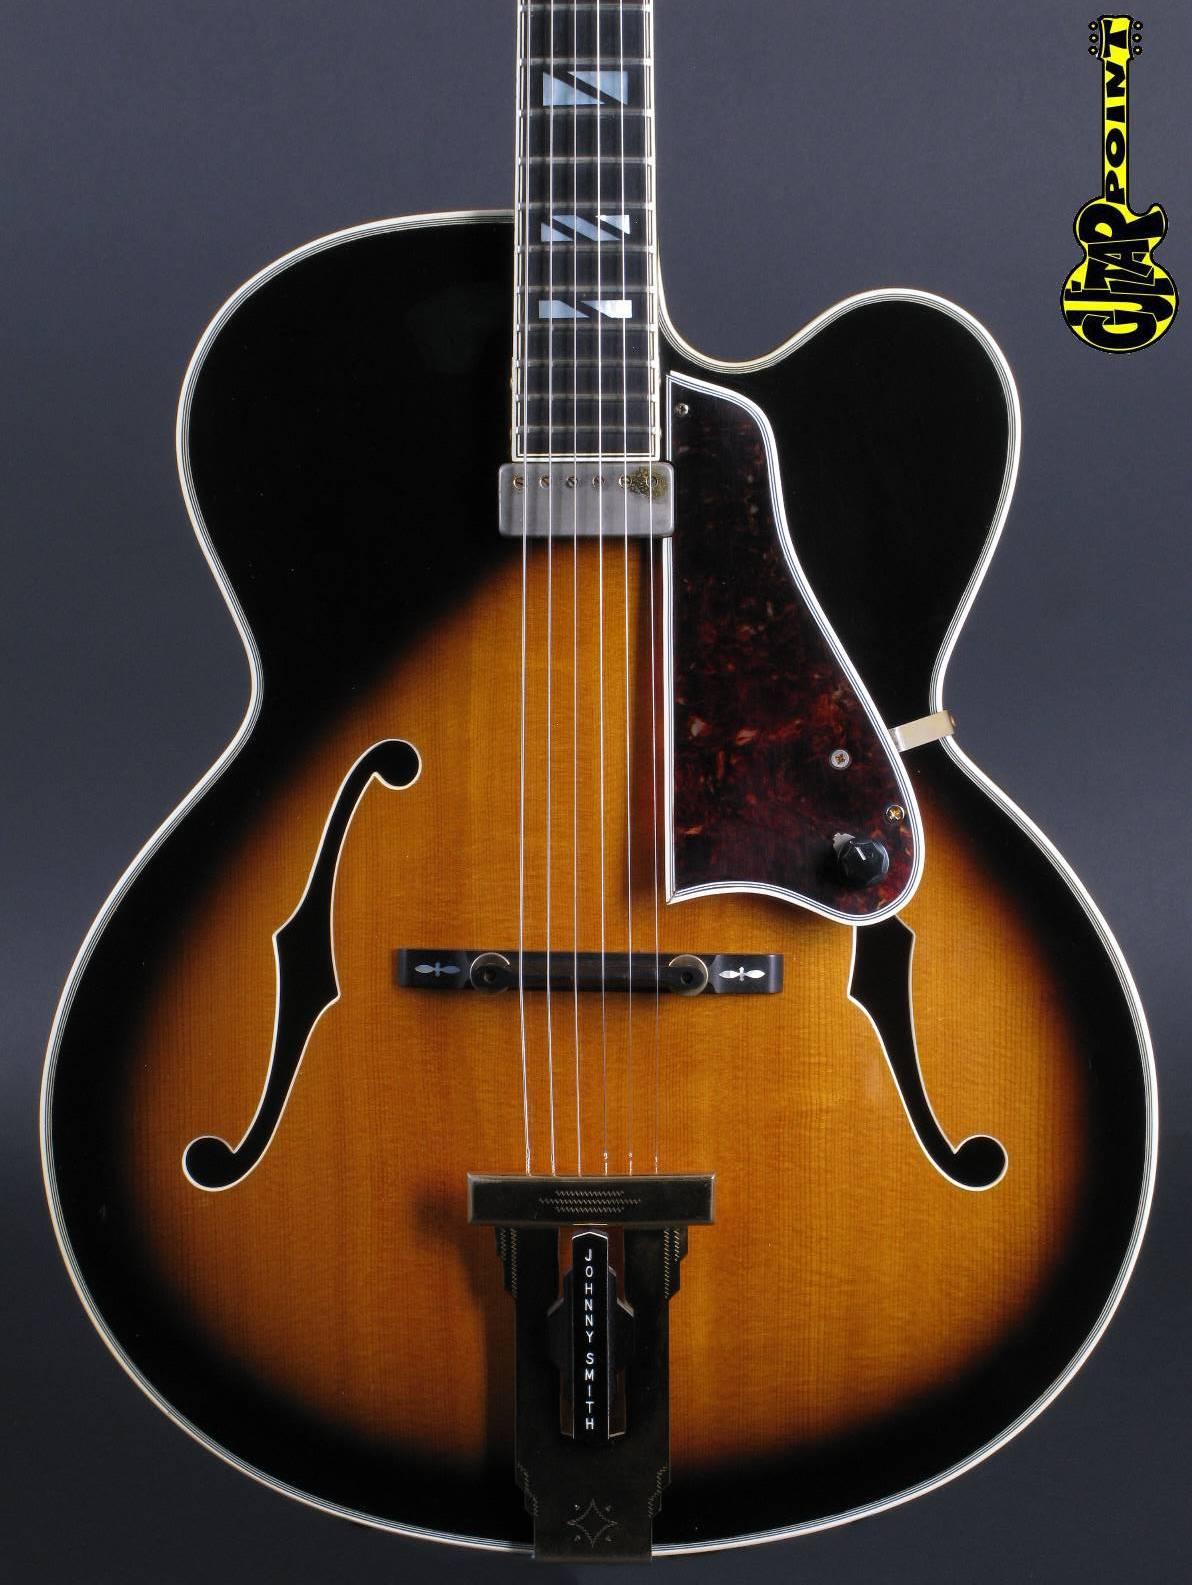 1976 Gibson Johnny Smith - Sunburst